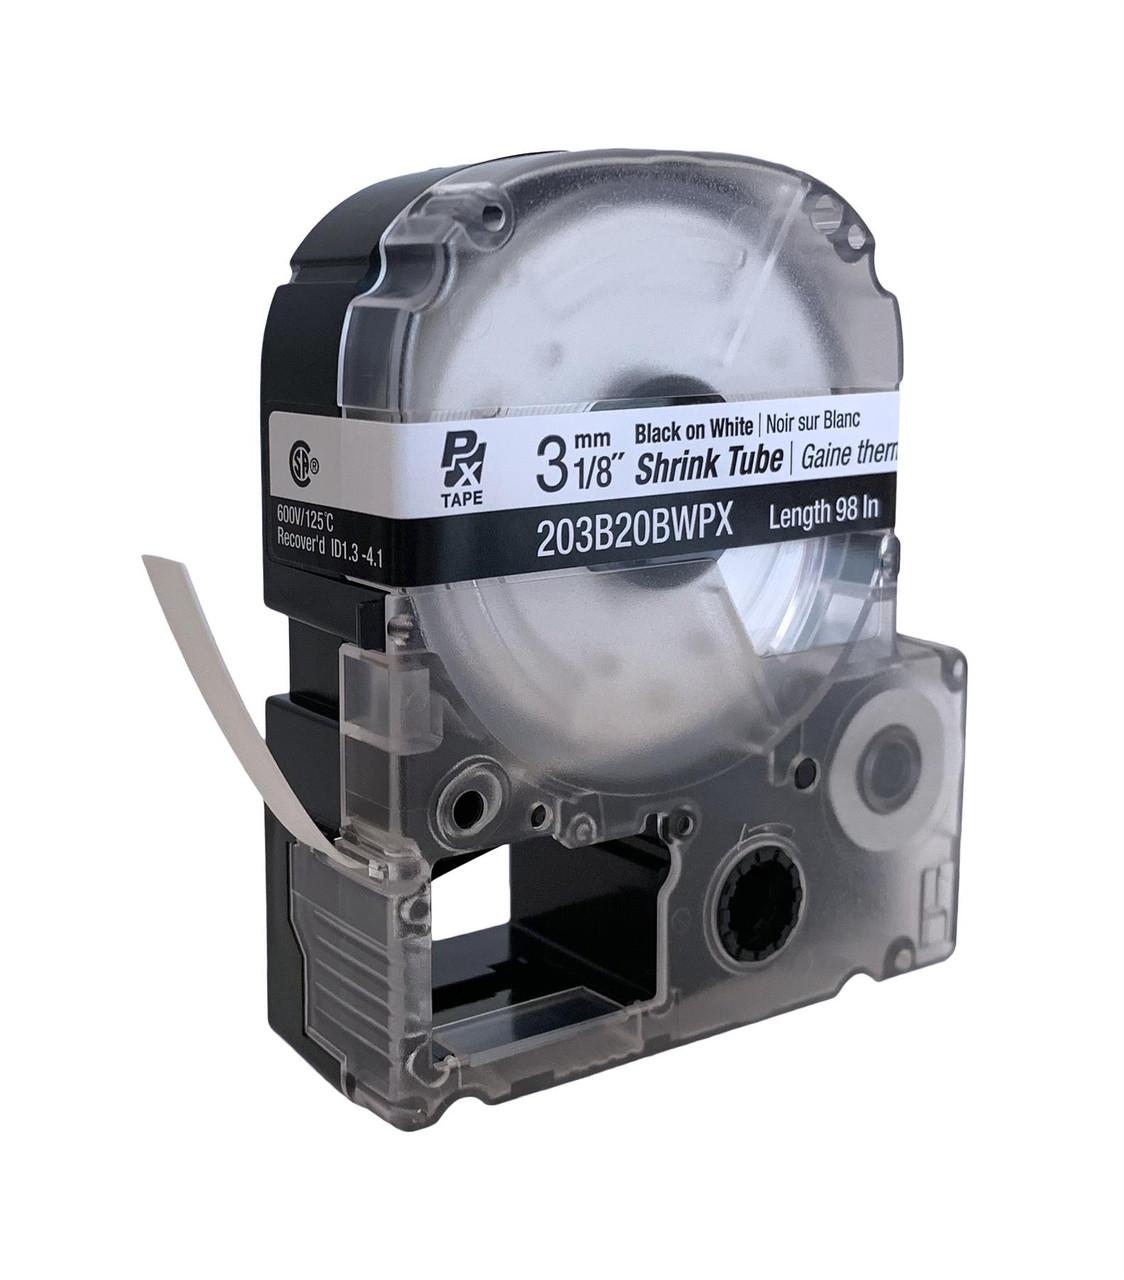 "Epson/K-SUN 203B20BWPX BLK ON WHT PX Label Tape 1/8""/3MM Shrink Tube Tape"